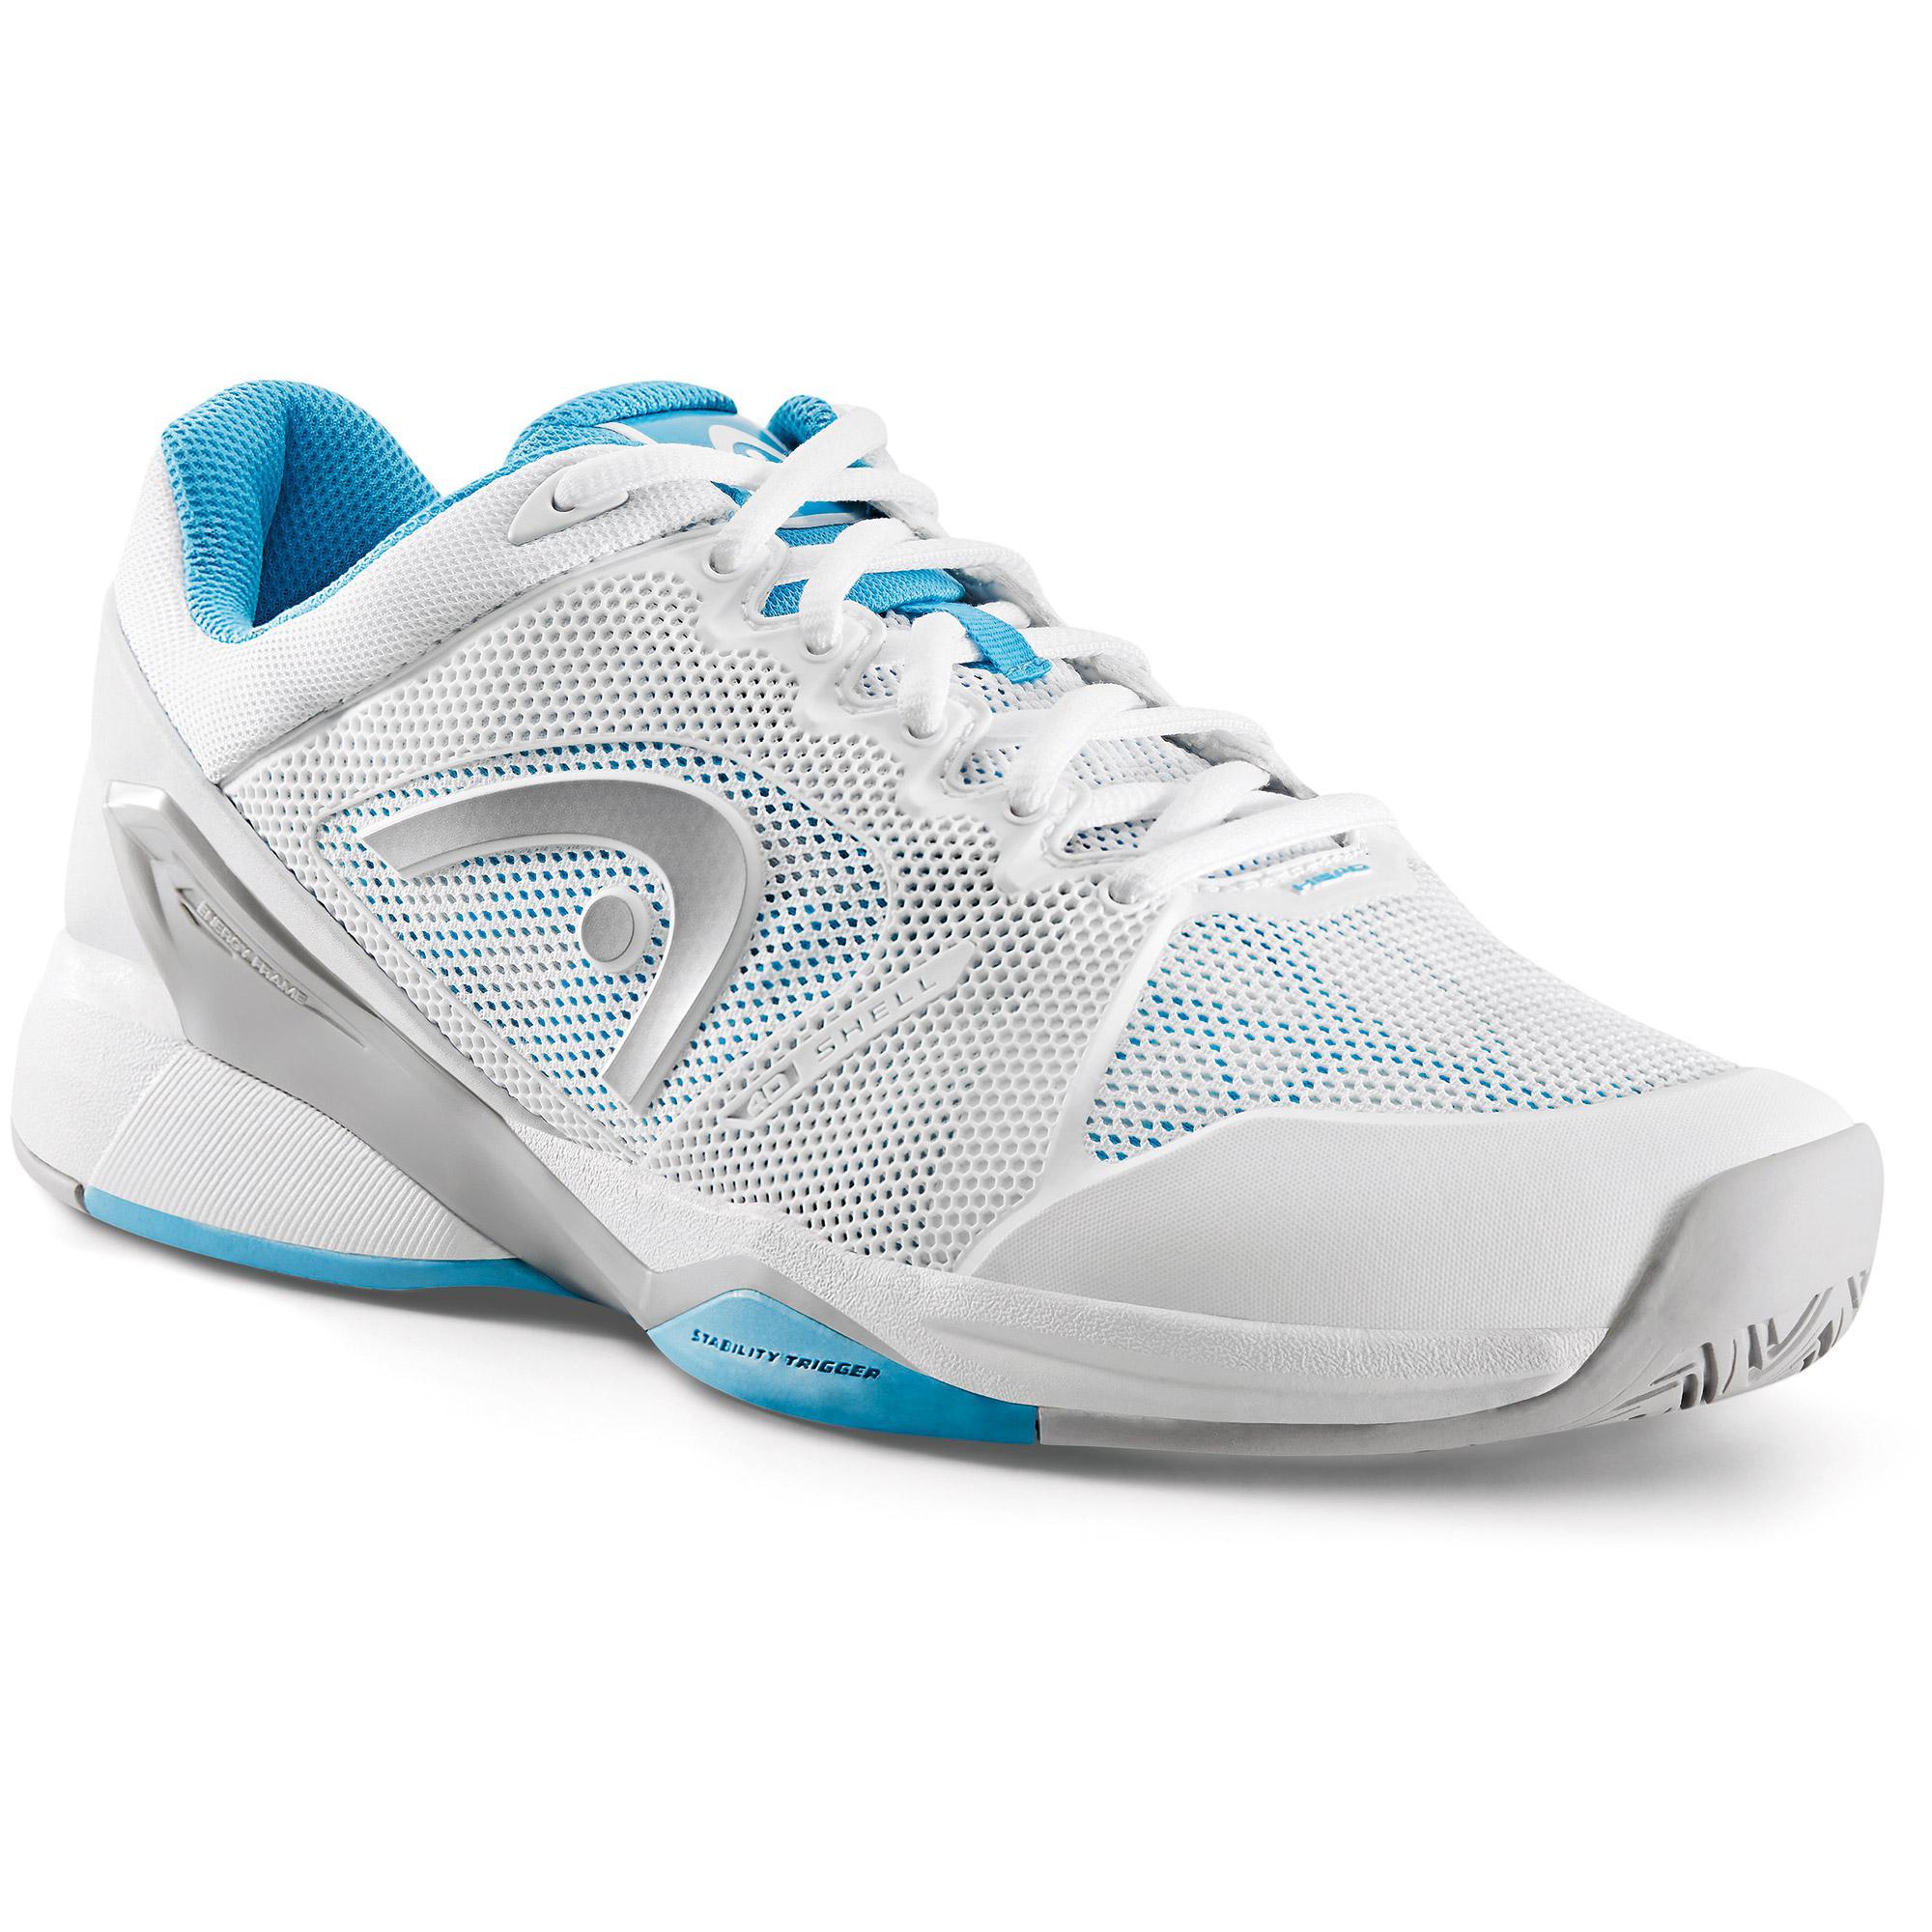 1e2679aa3a6cf Head Womens Revolt Pro 2.0 Tennis Shoes - White Blue - Tennisnuts.com